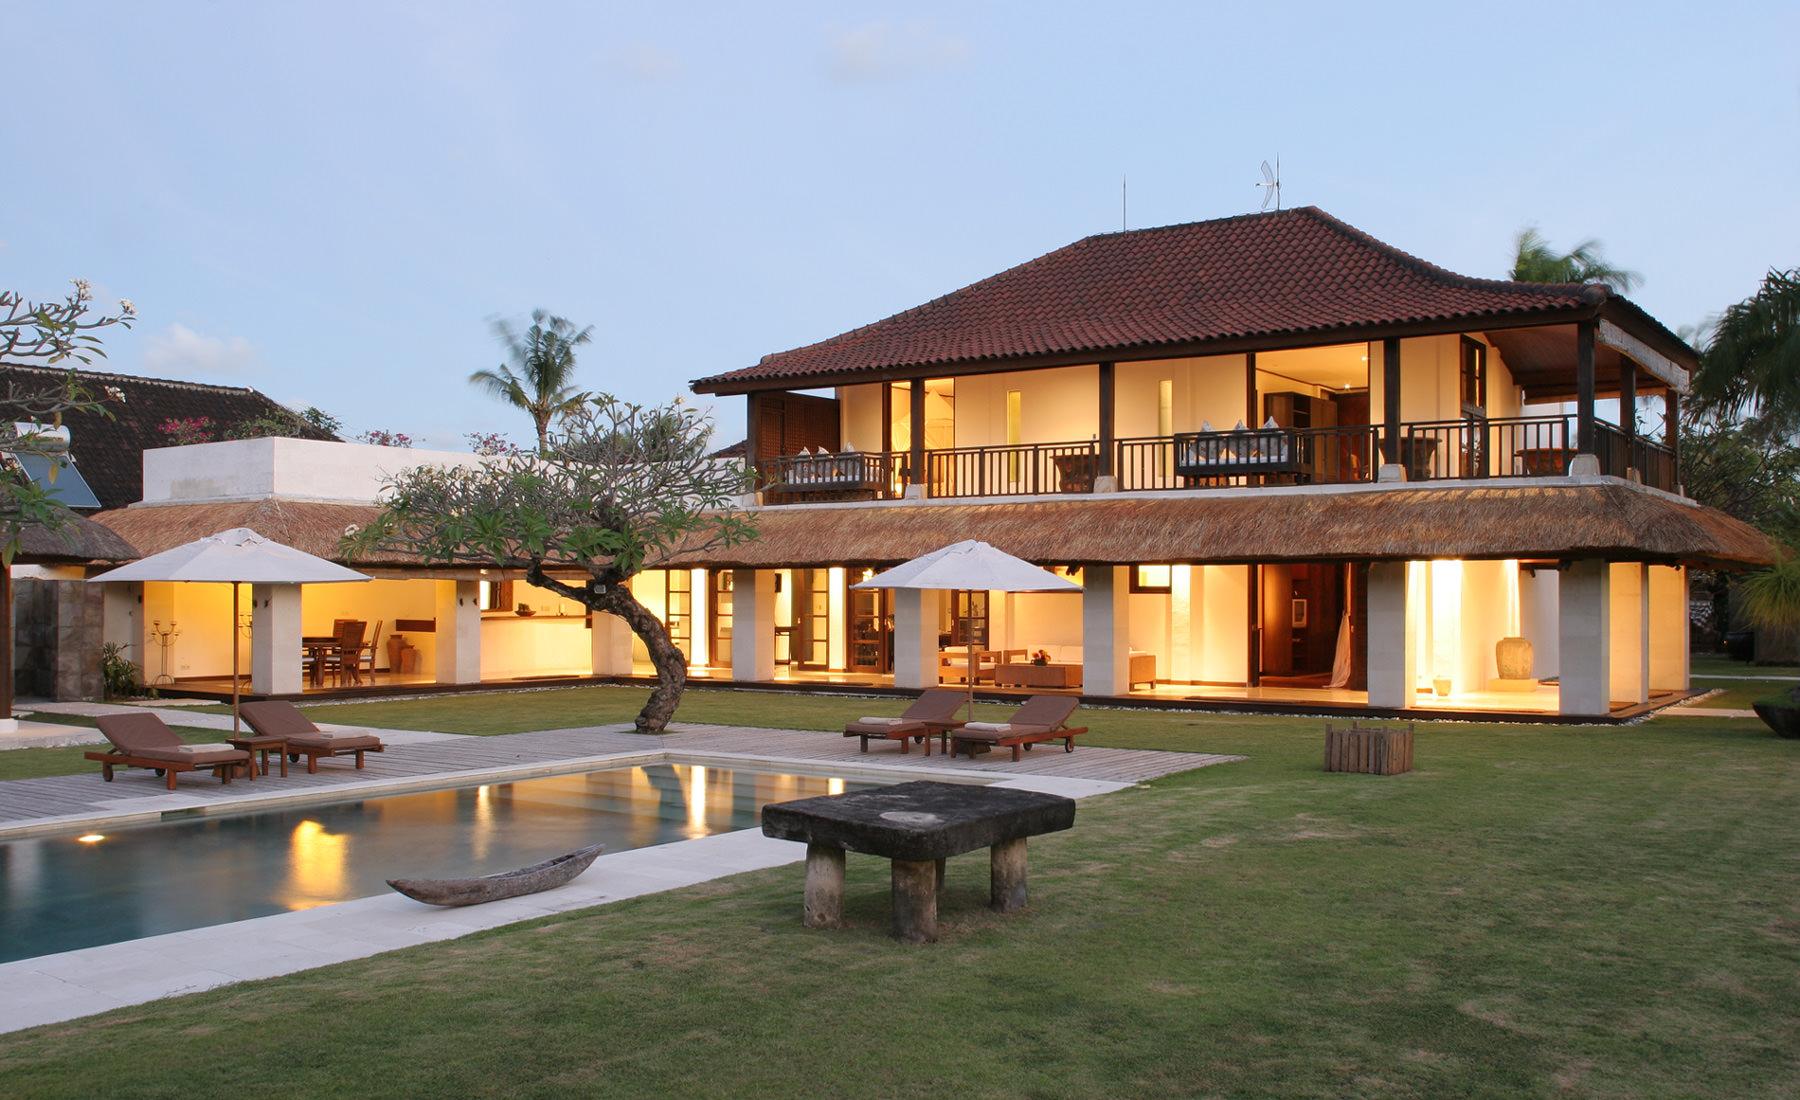 Bali Villa Yoyo Batu Belig Seminyak Luxury Villas